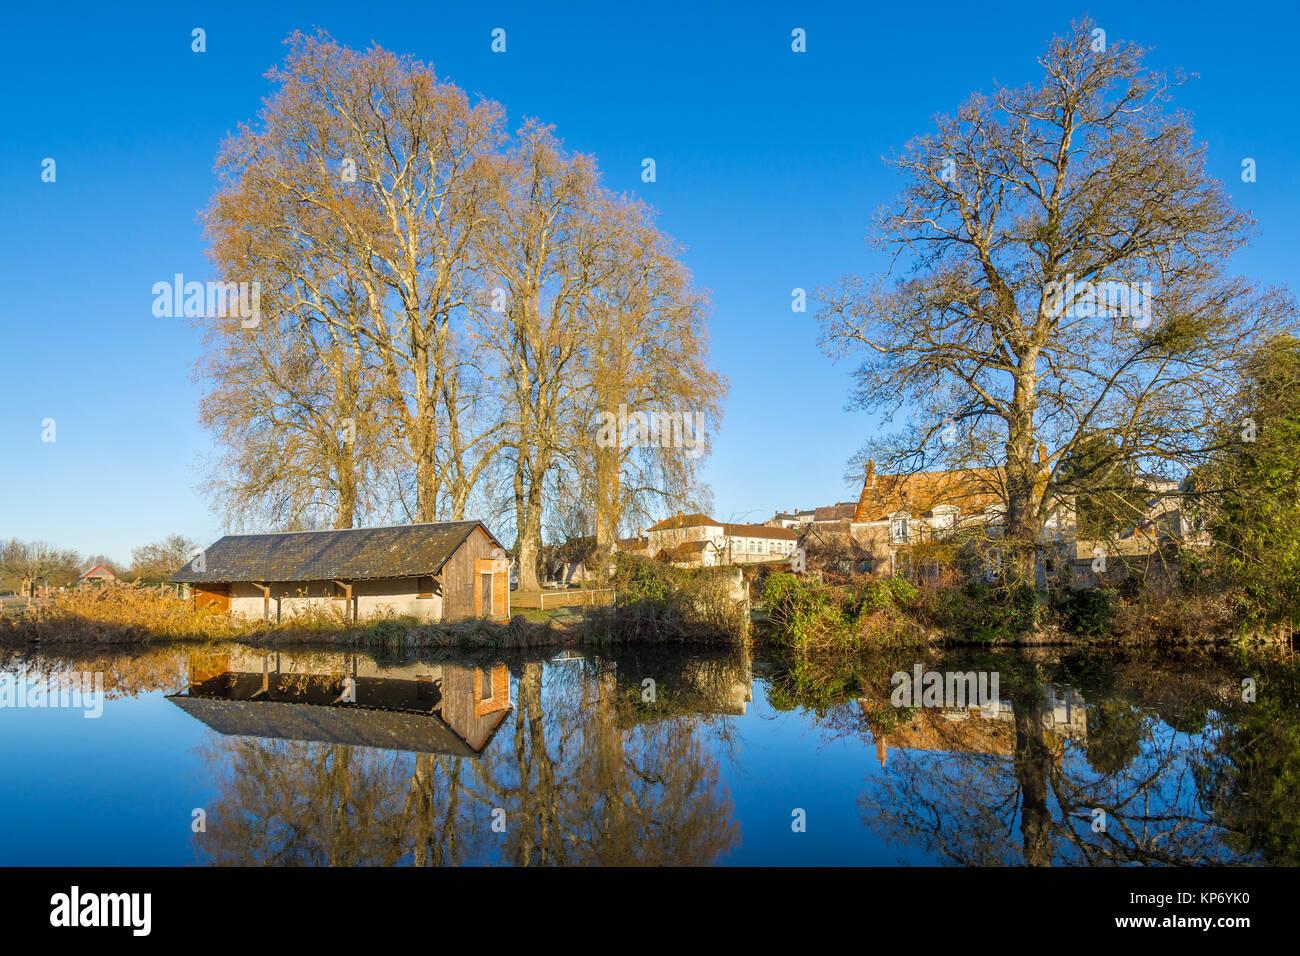 Old public wash-house 'lavoir' on river Claise, Preuilly-sur-Claise, France. - Stock Image